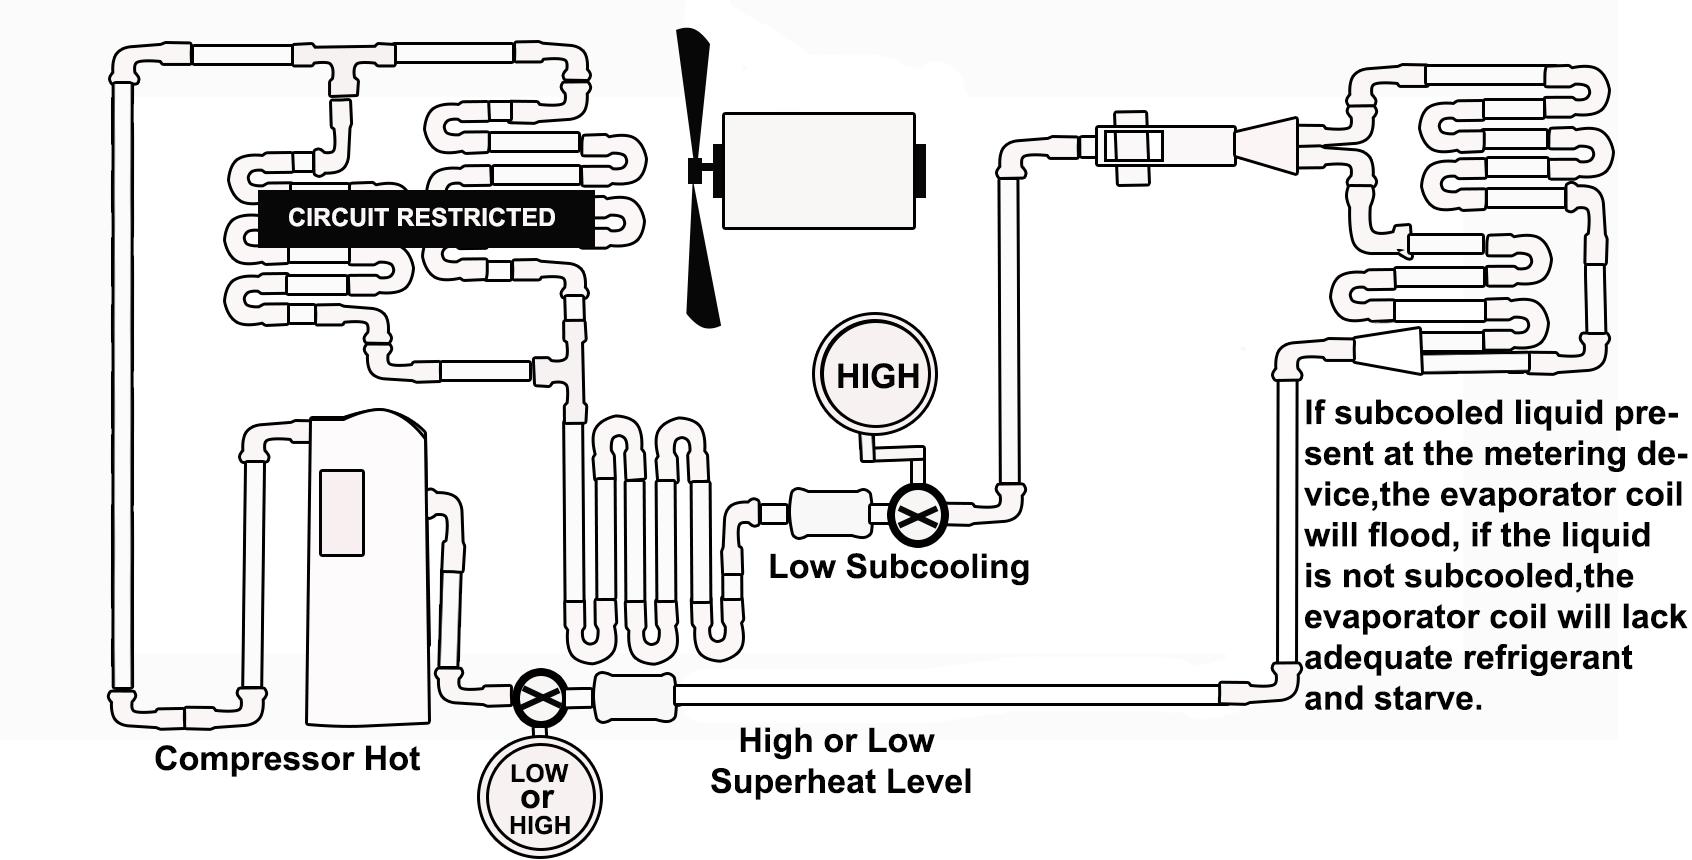 Restriction - Condenser (Fixed Orifice)